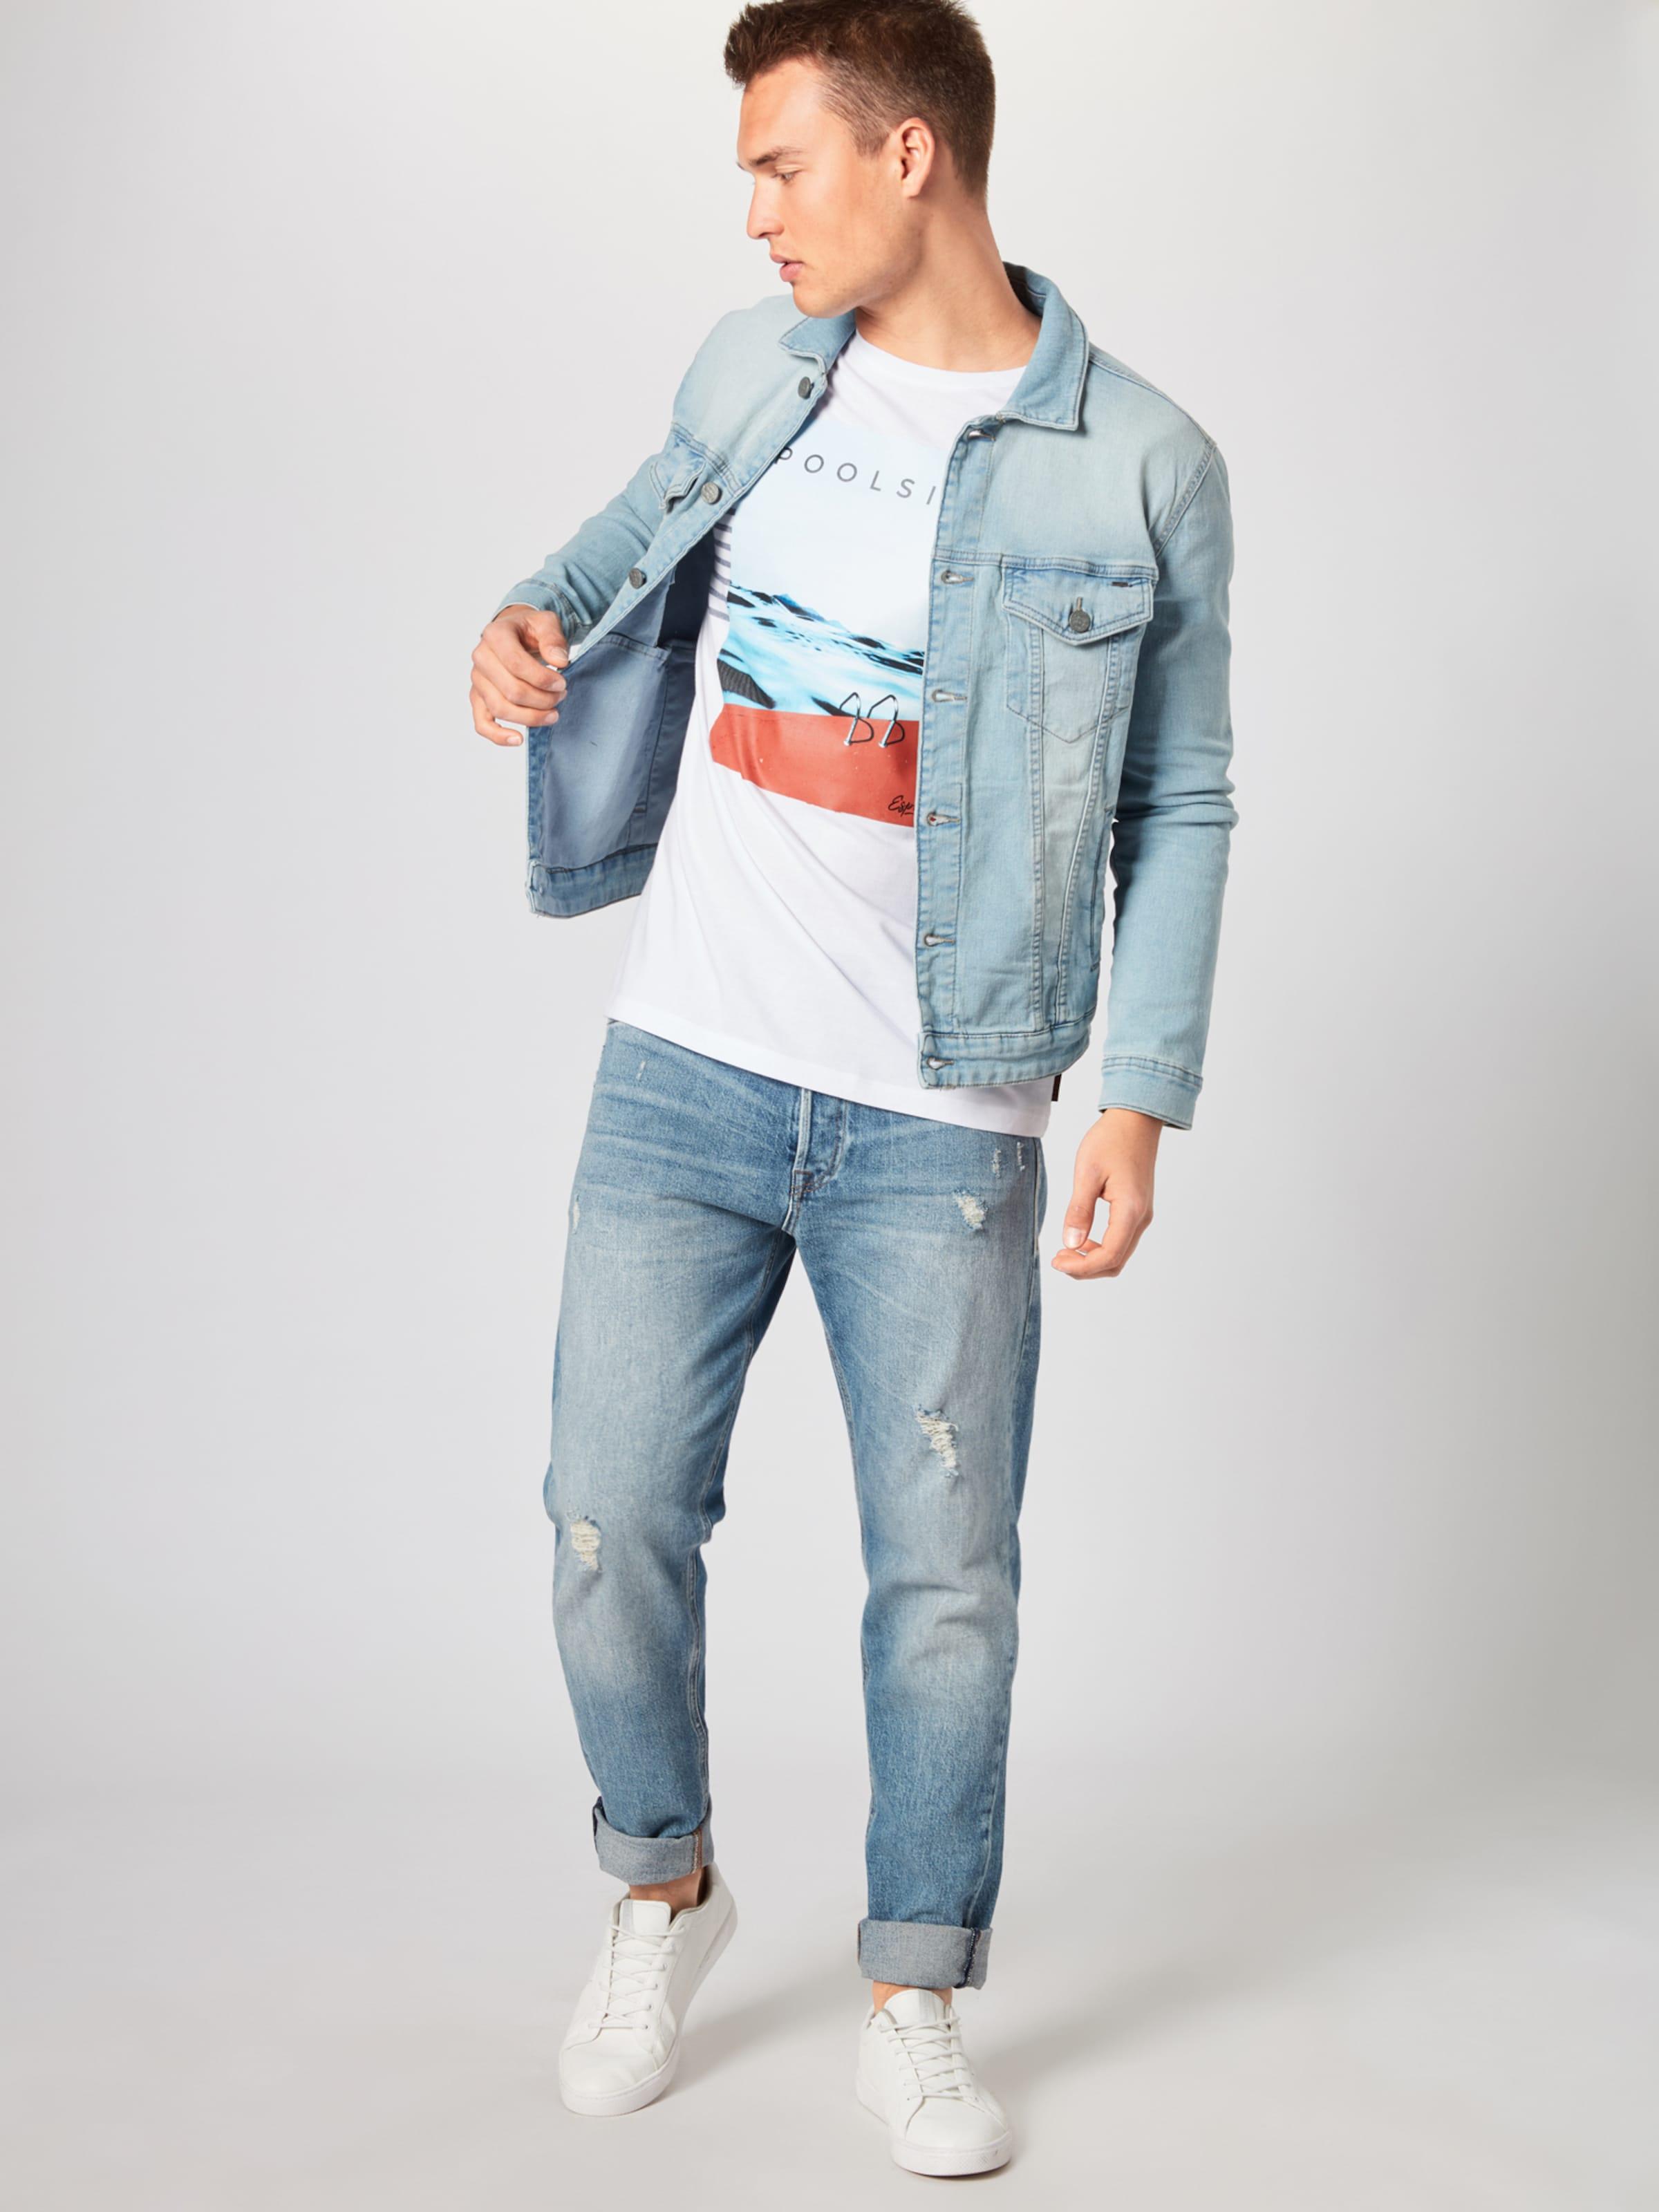 En 'sg T Blanc Cassé Esprit shirt 069ee2k010' n0Nvm8wO